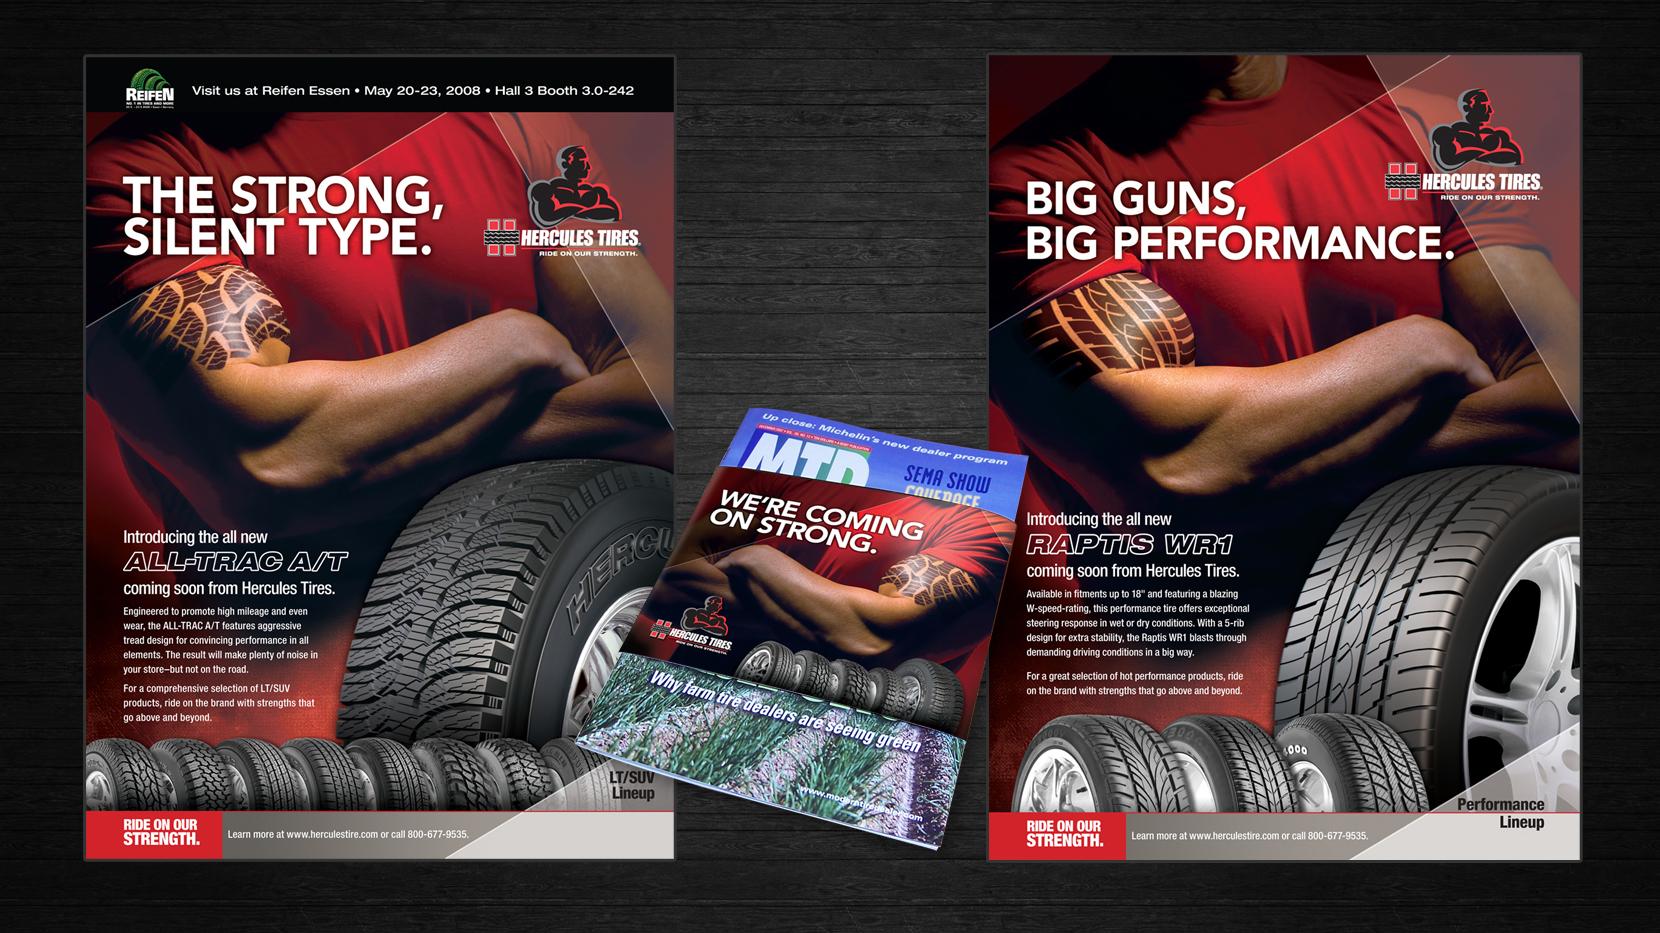 Hercules tires ads